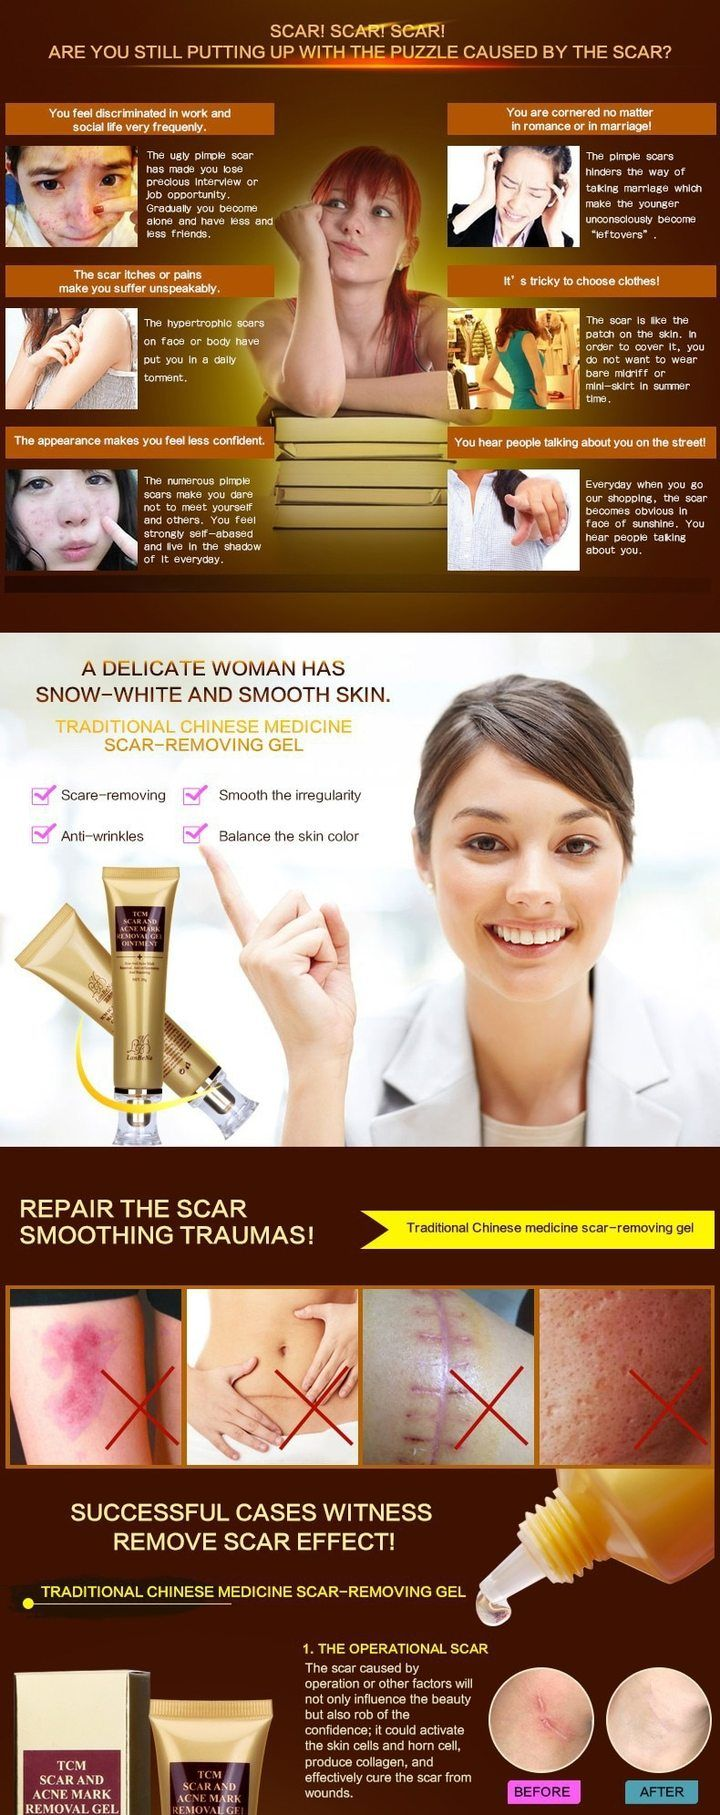 Acne Scar Remover Cream Scar removal cream, Acne scar